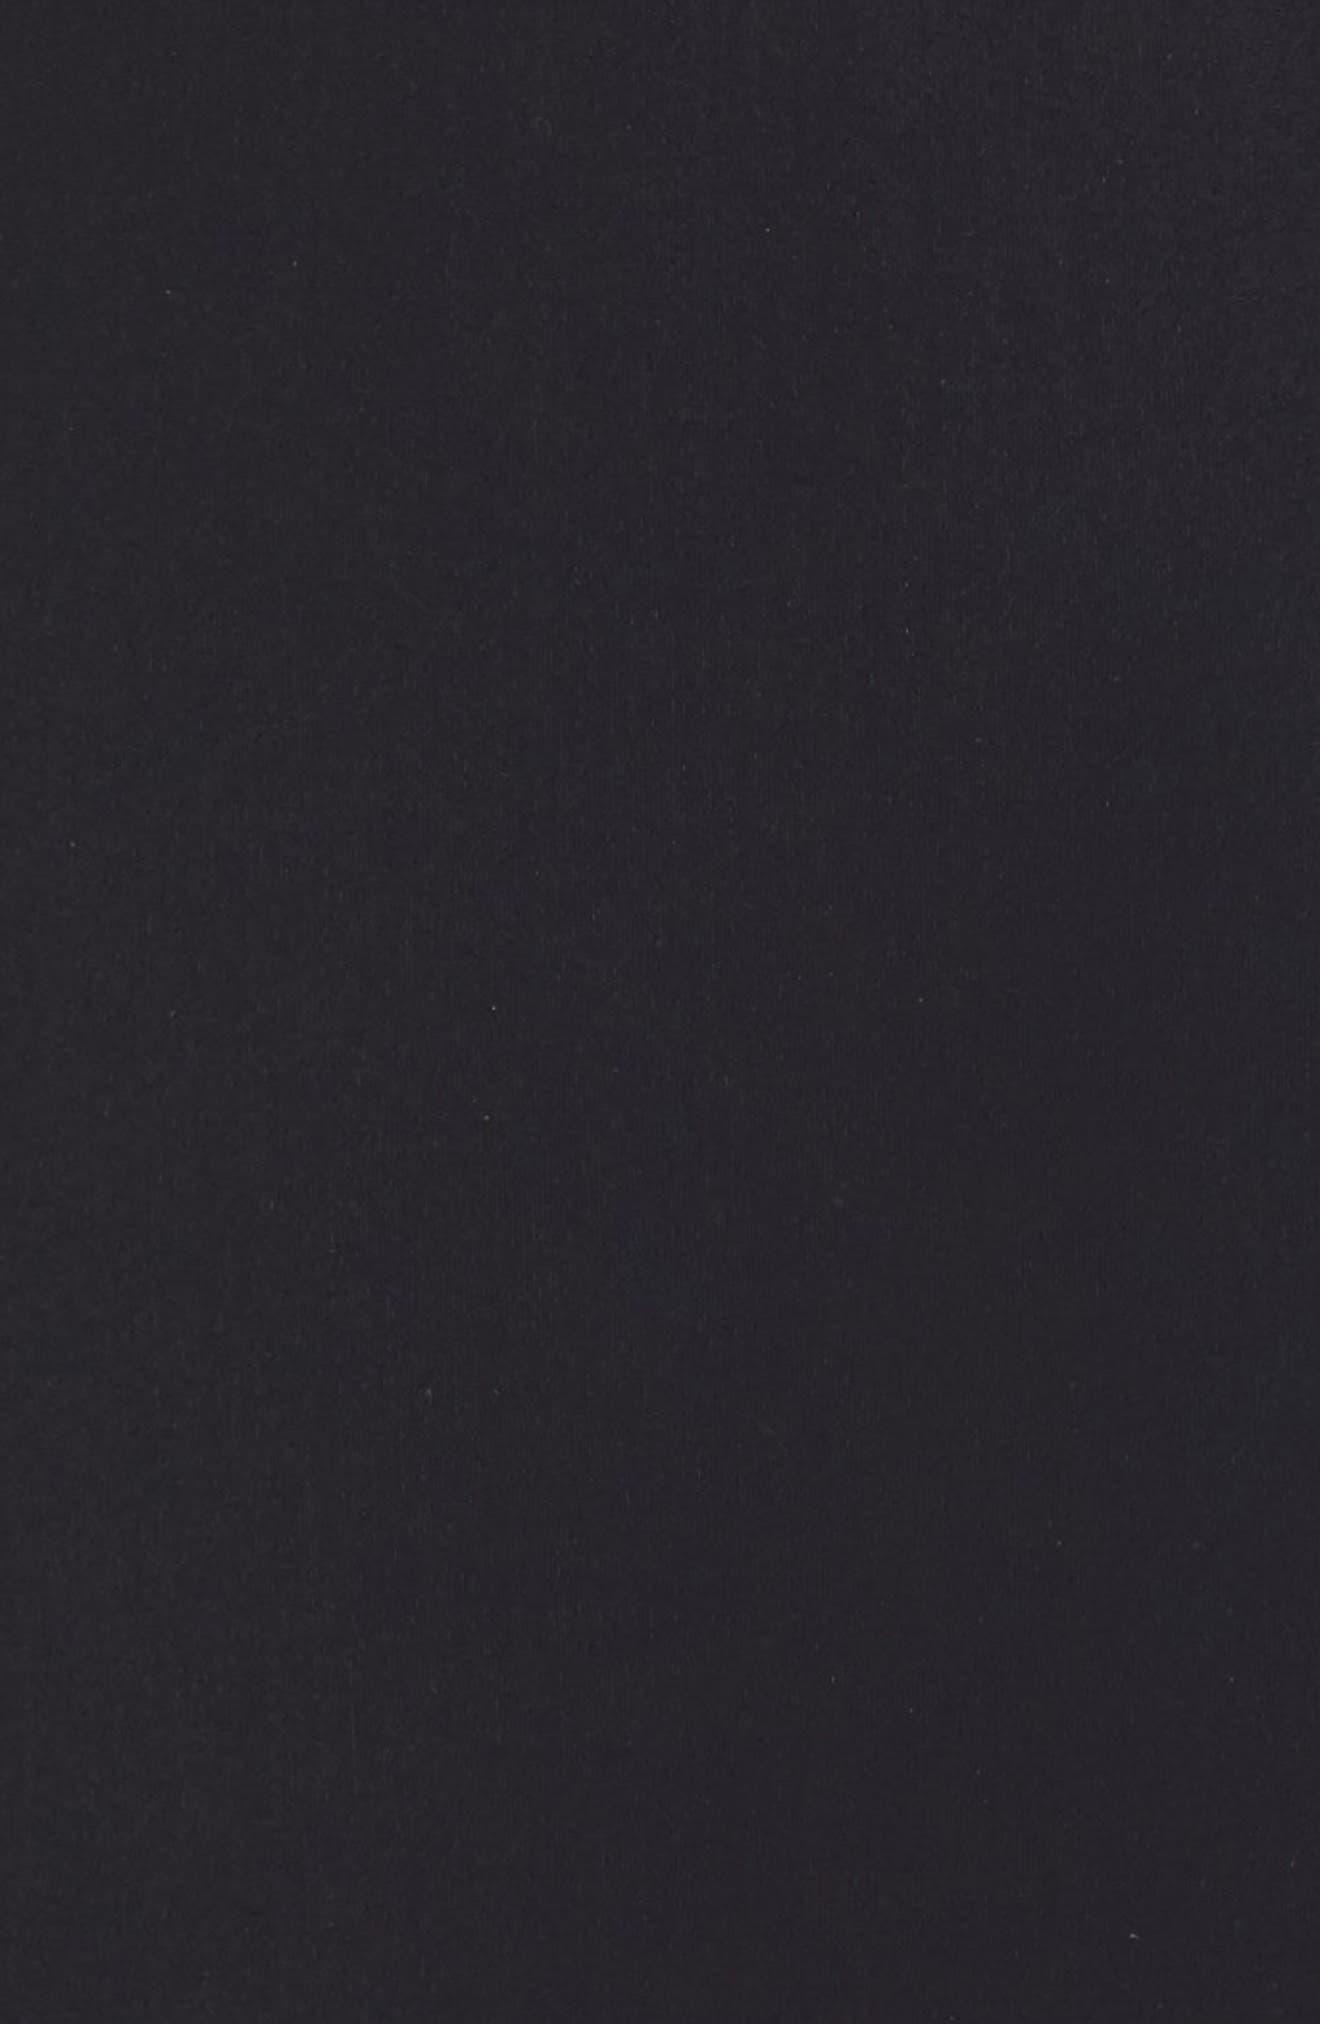 Belle Curve Peplum One-Piece Swimsuit,                             Alternate thumbnail 5, color,                             Black/ White